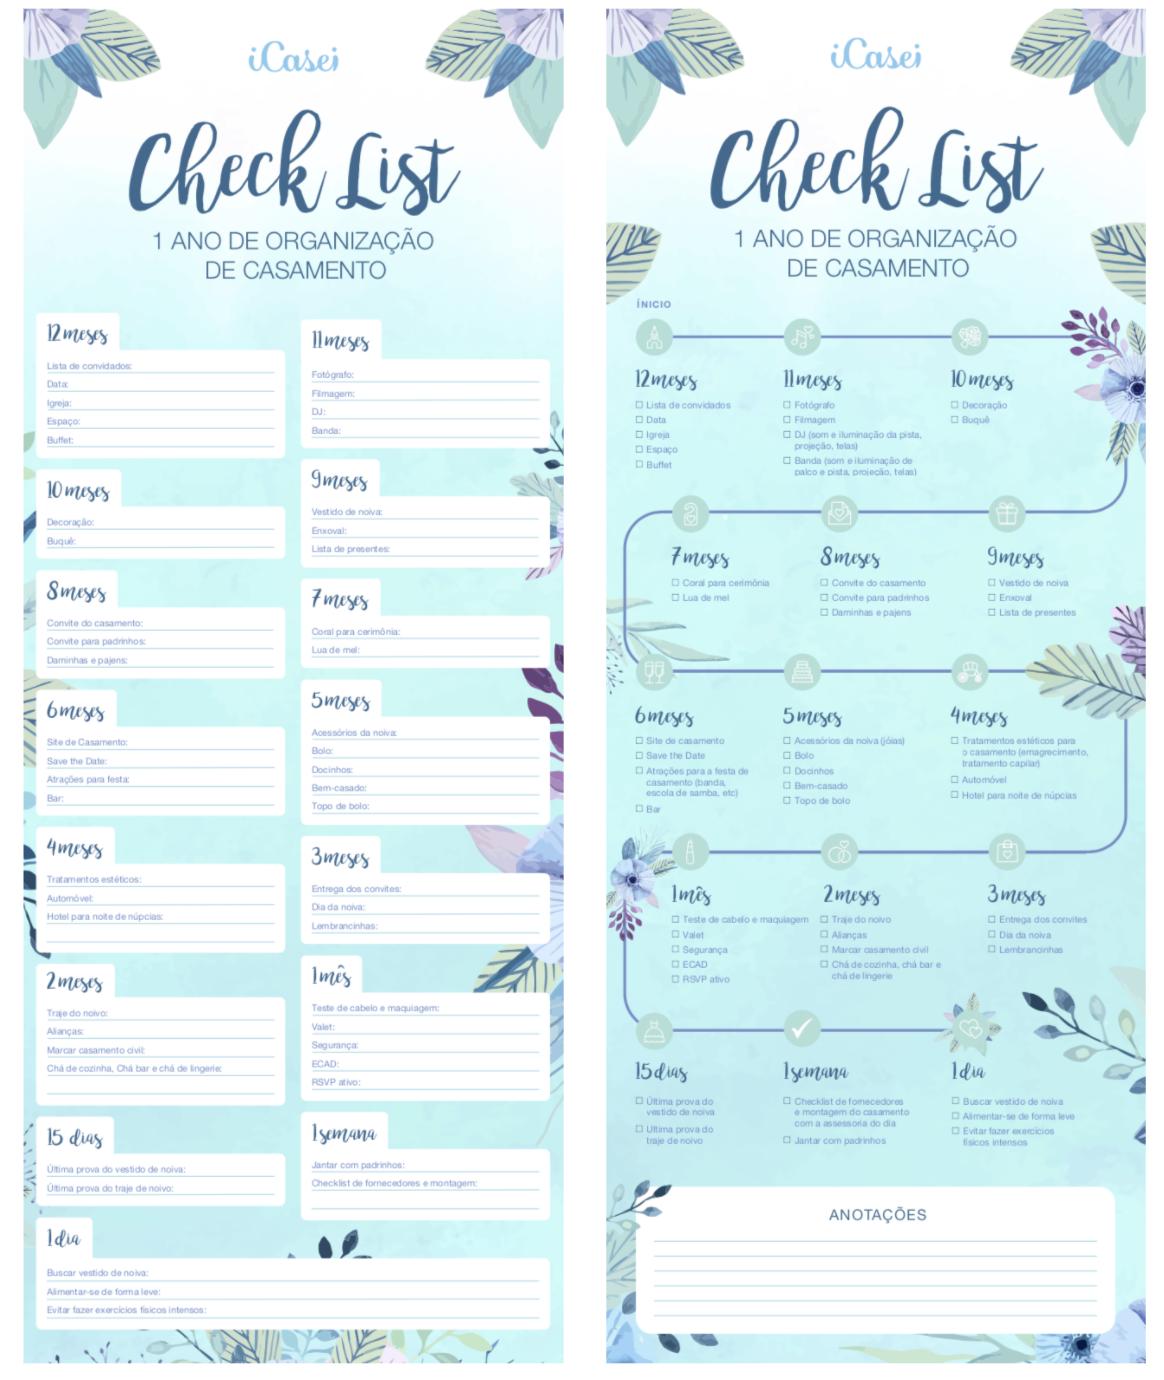 checklist-casamento